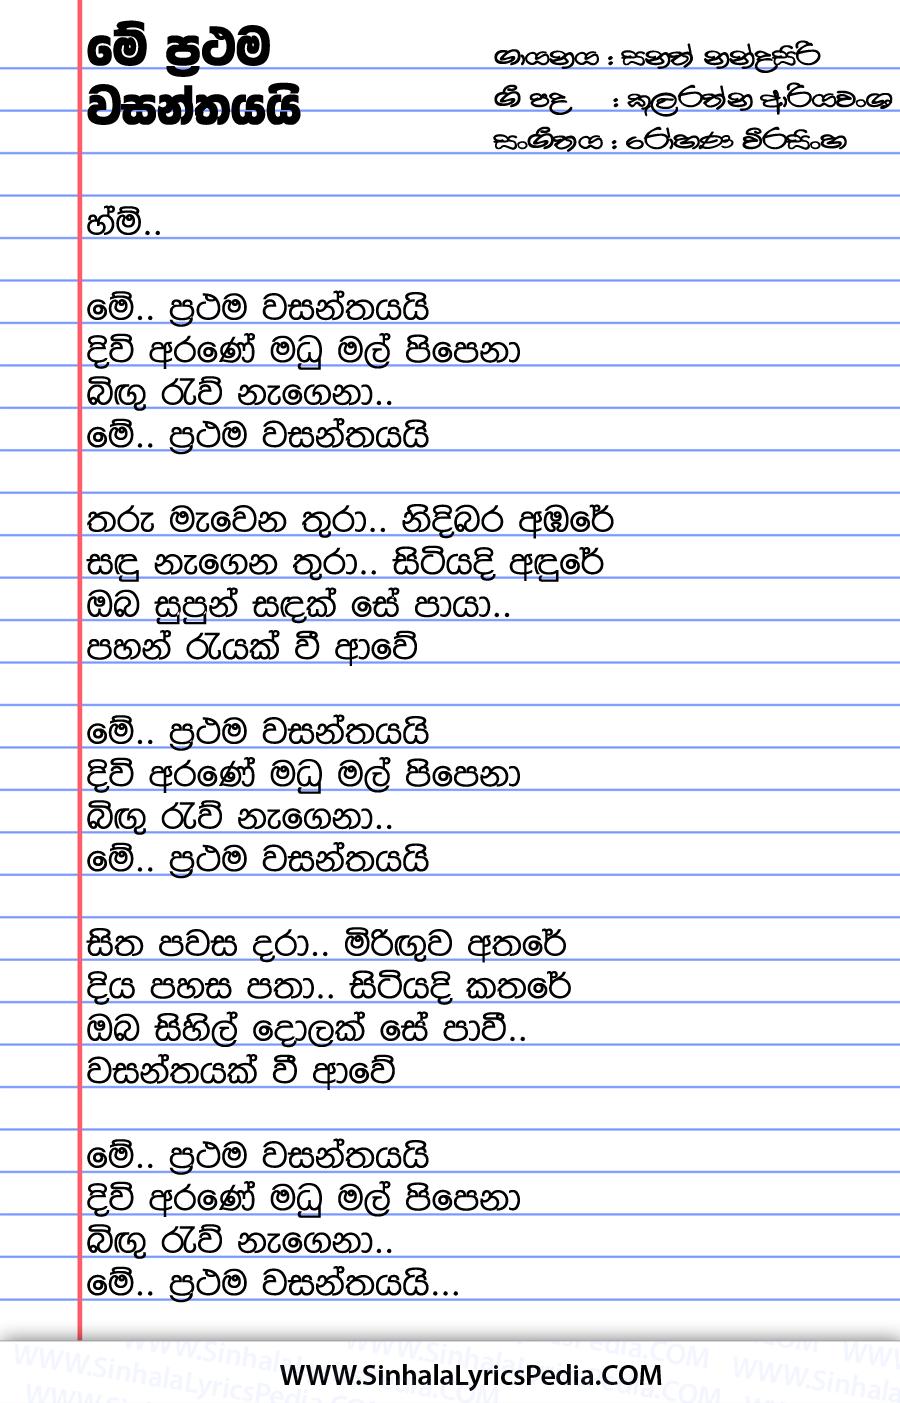 Me Prathama Wasanthayai Song Lyrics